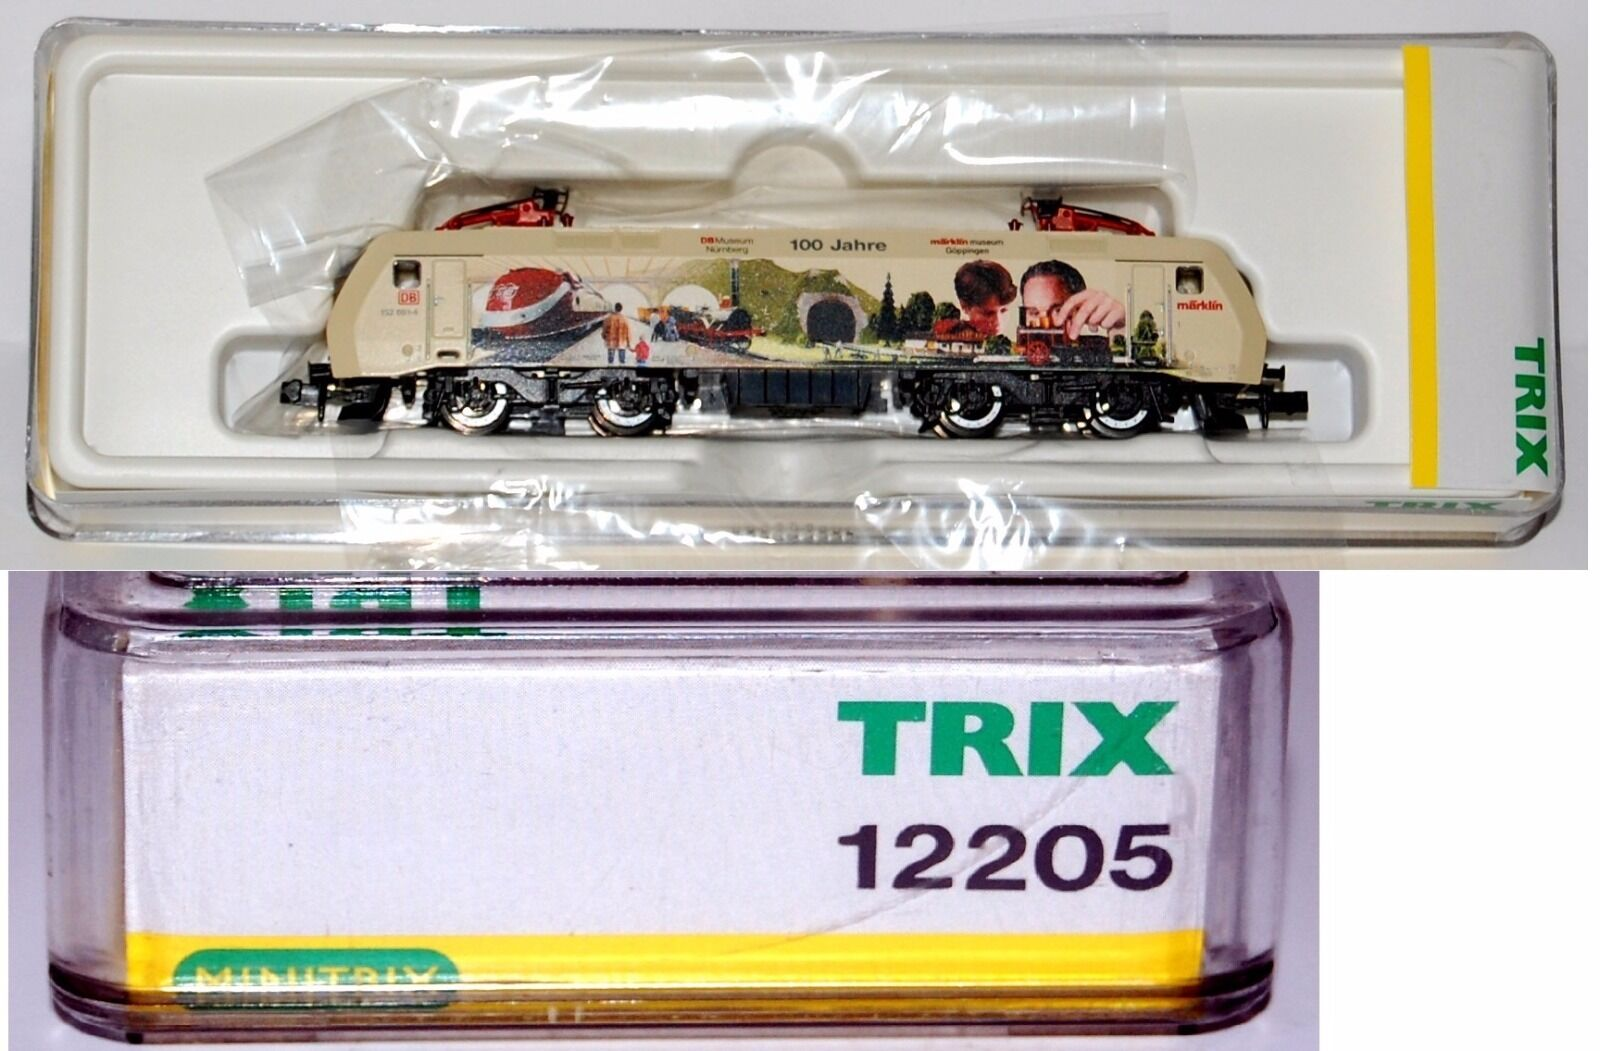 TRIX 12205– LOCO ELETTRICA E152 MUSEUM– DB- EP. V